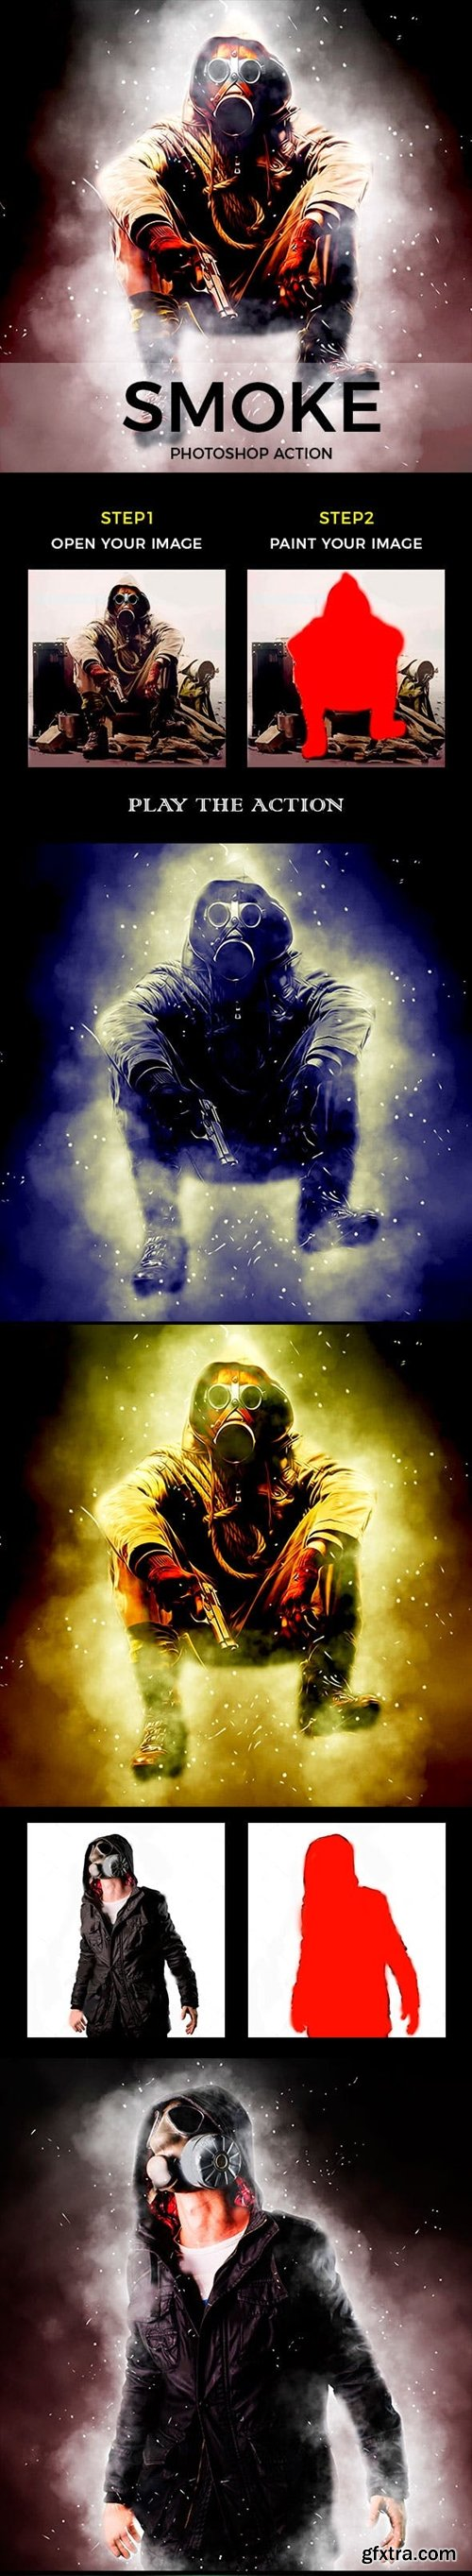 Graphicriver - Smoke Photoshop Action 20971221